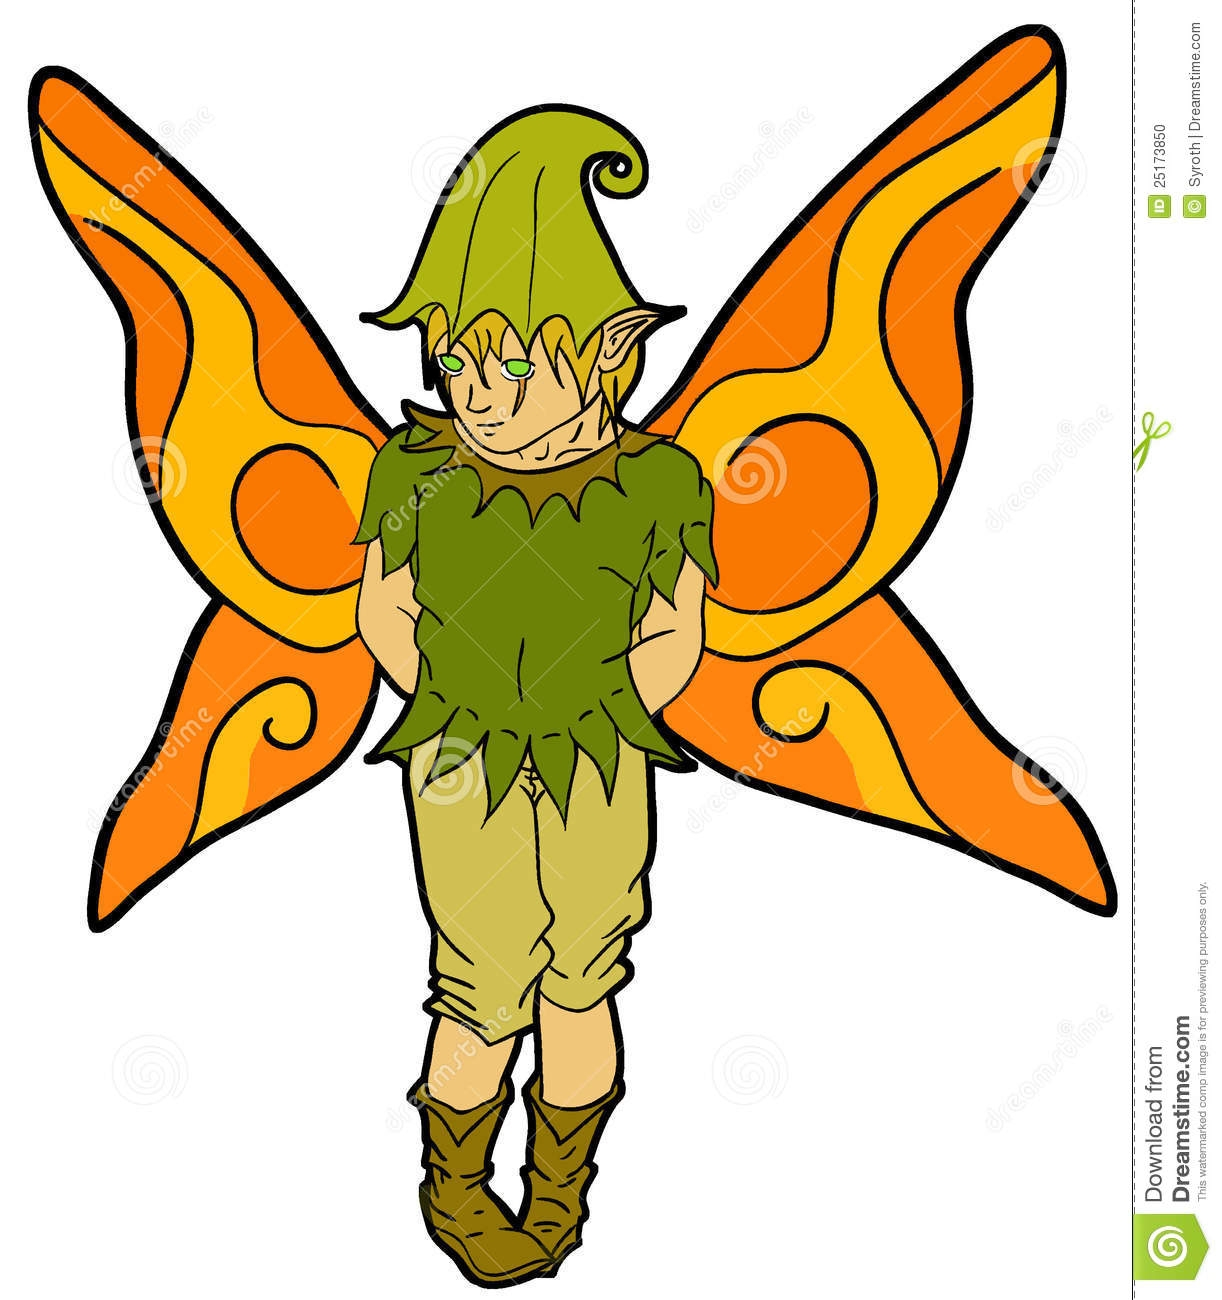 Fairy boy. Clipart free download best